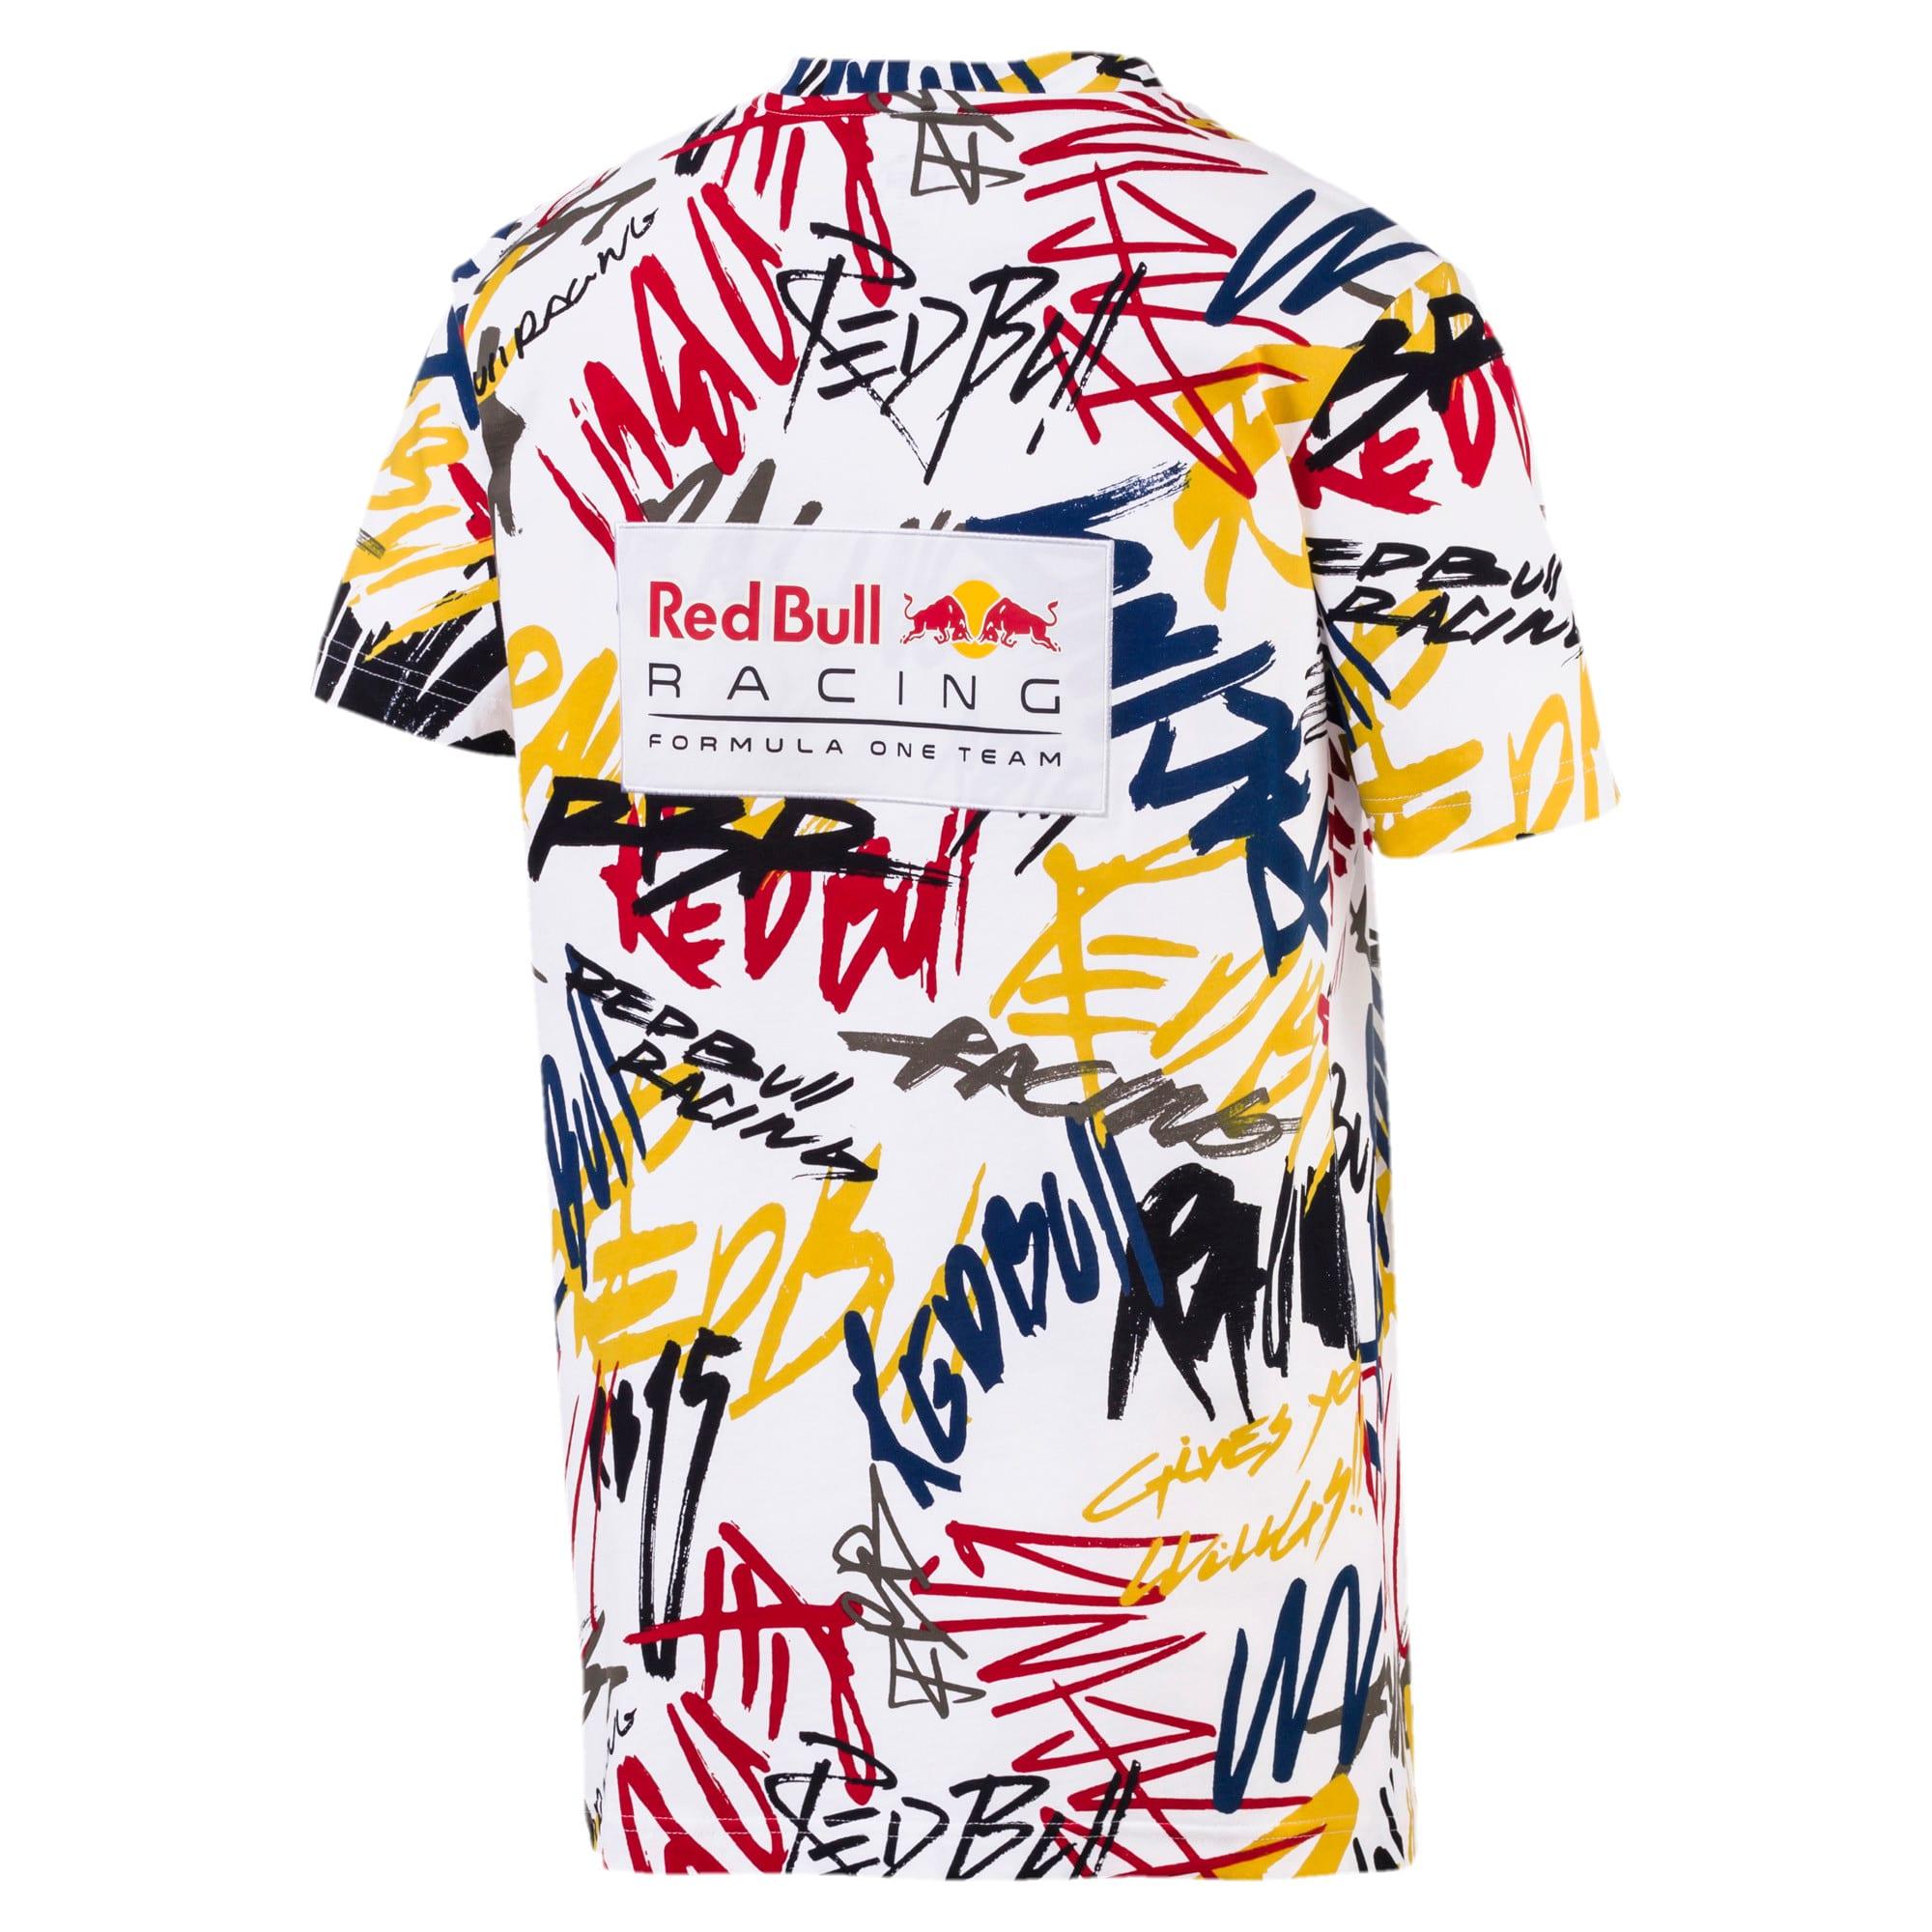 Thumbnail 2 of Red Bull Racing Men's Tee, Puma White, medium